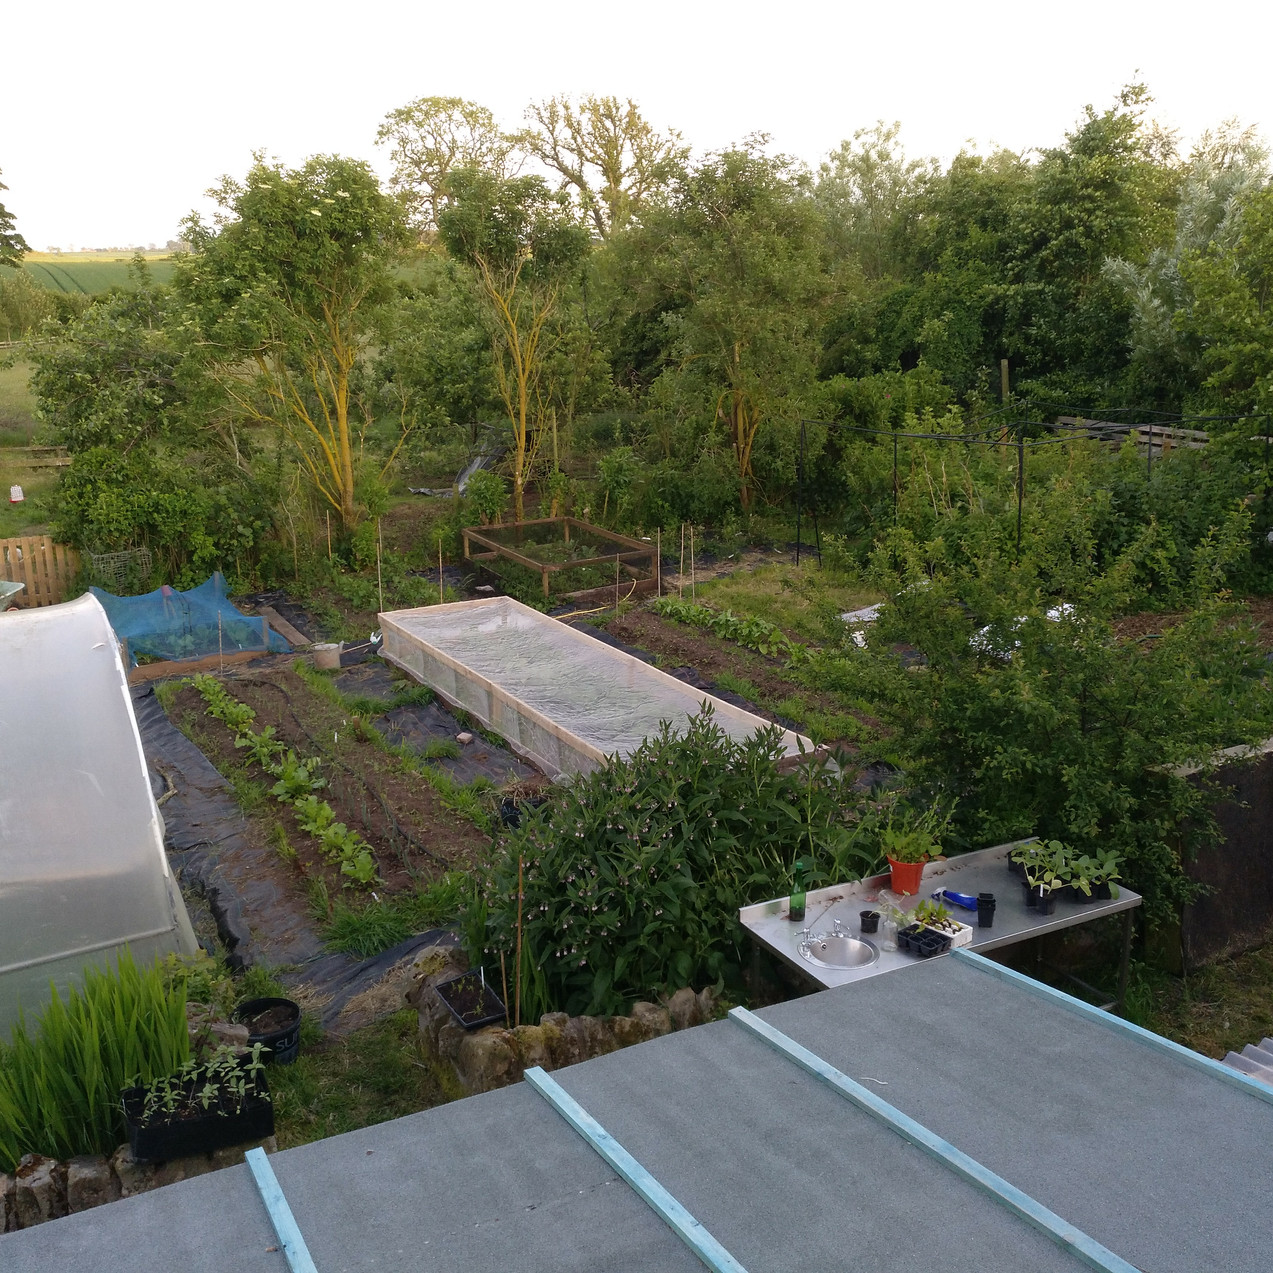 Veg garden starting to take shape